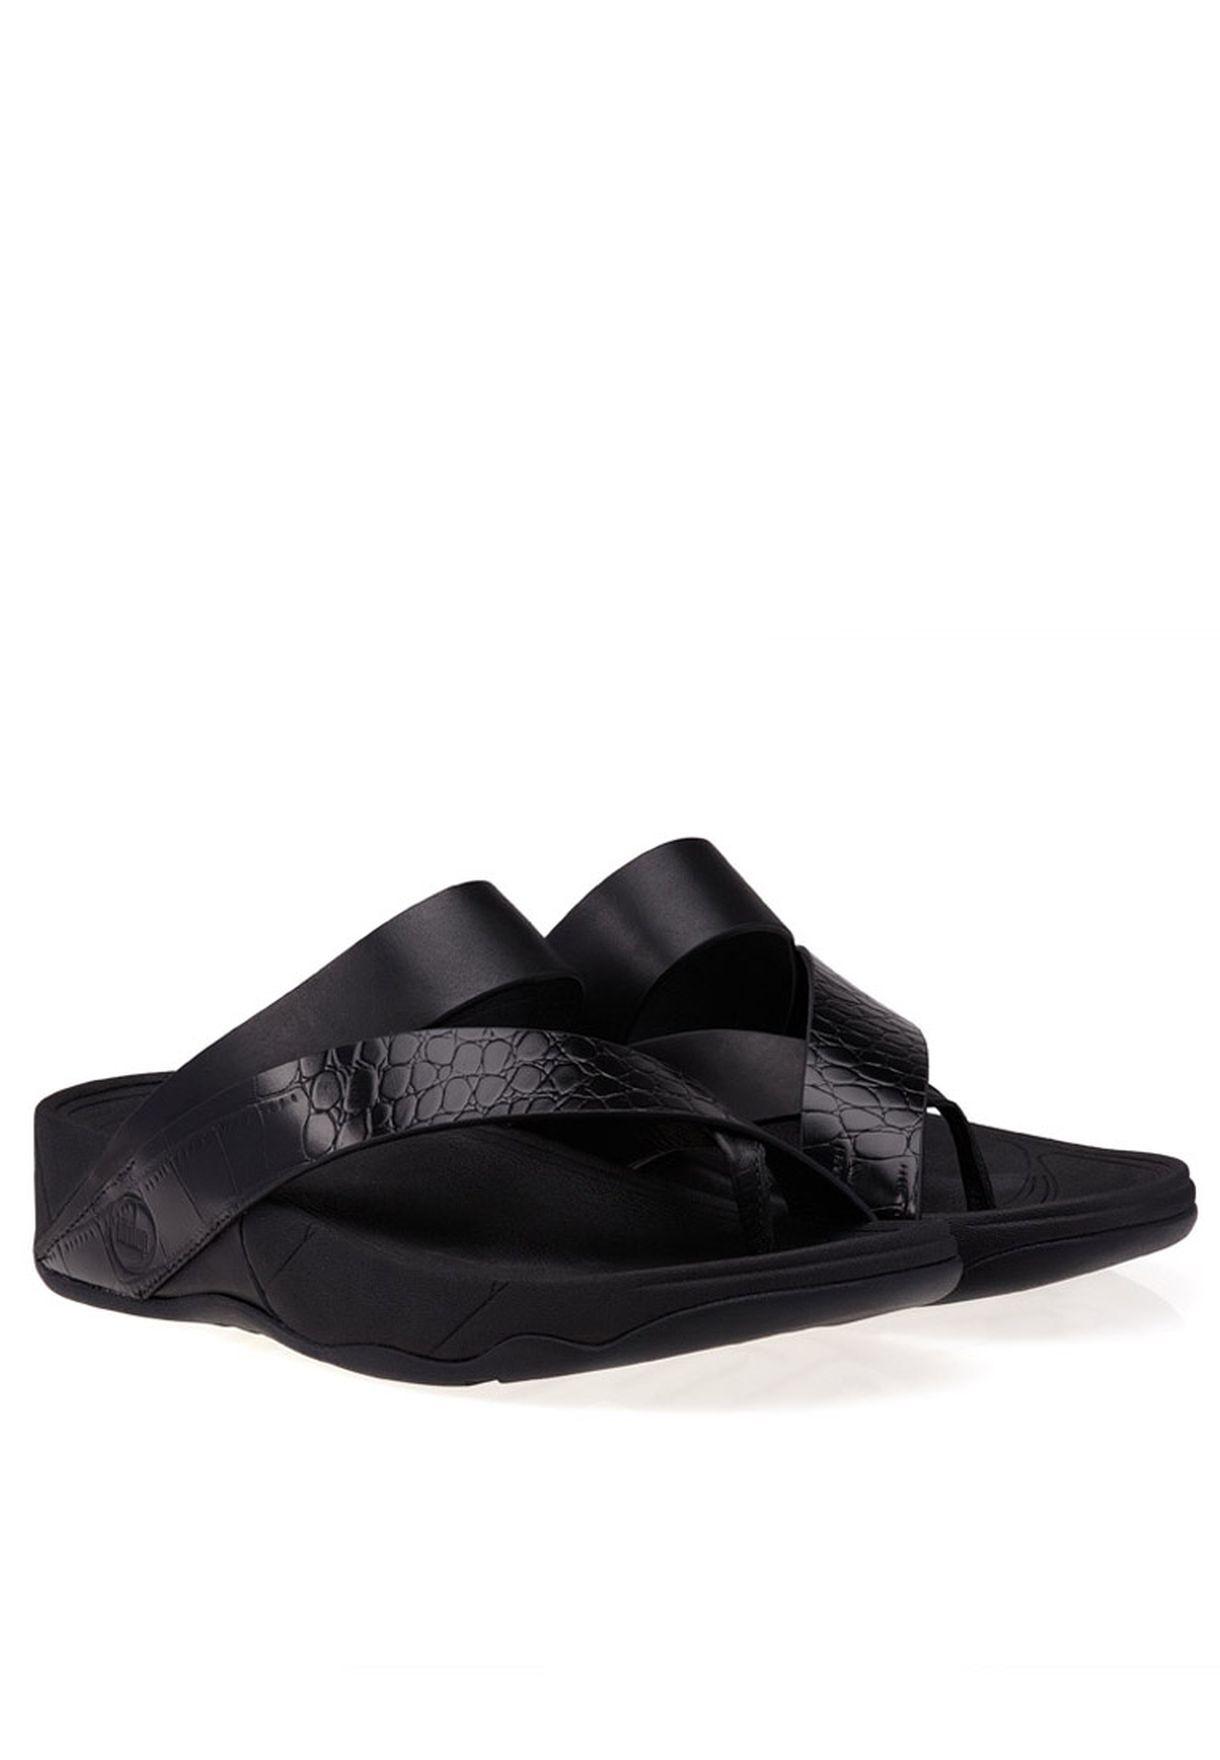 1ecfb15922f37d Shop Fitflop black Sling M Lux Casual Sandal for Men in UAE ...